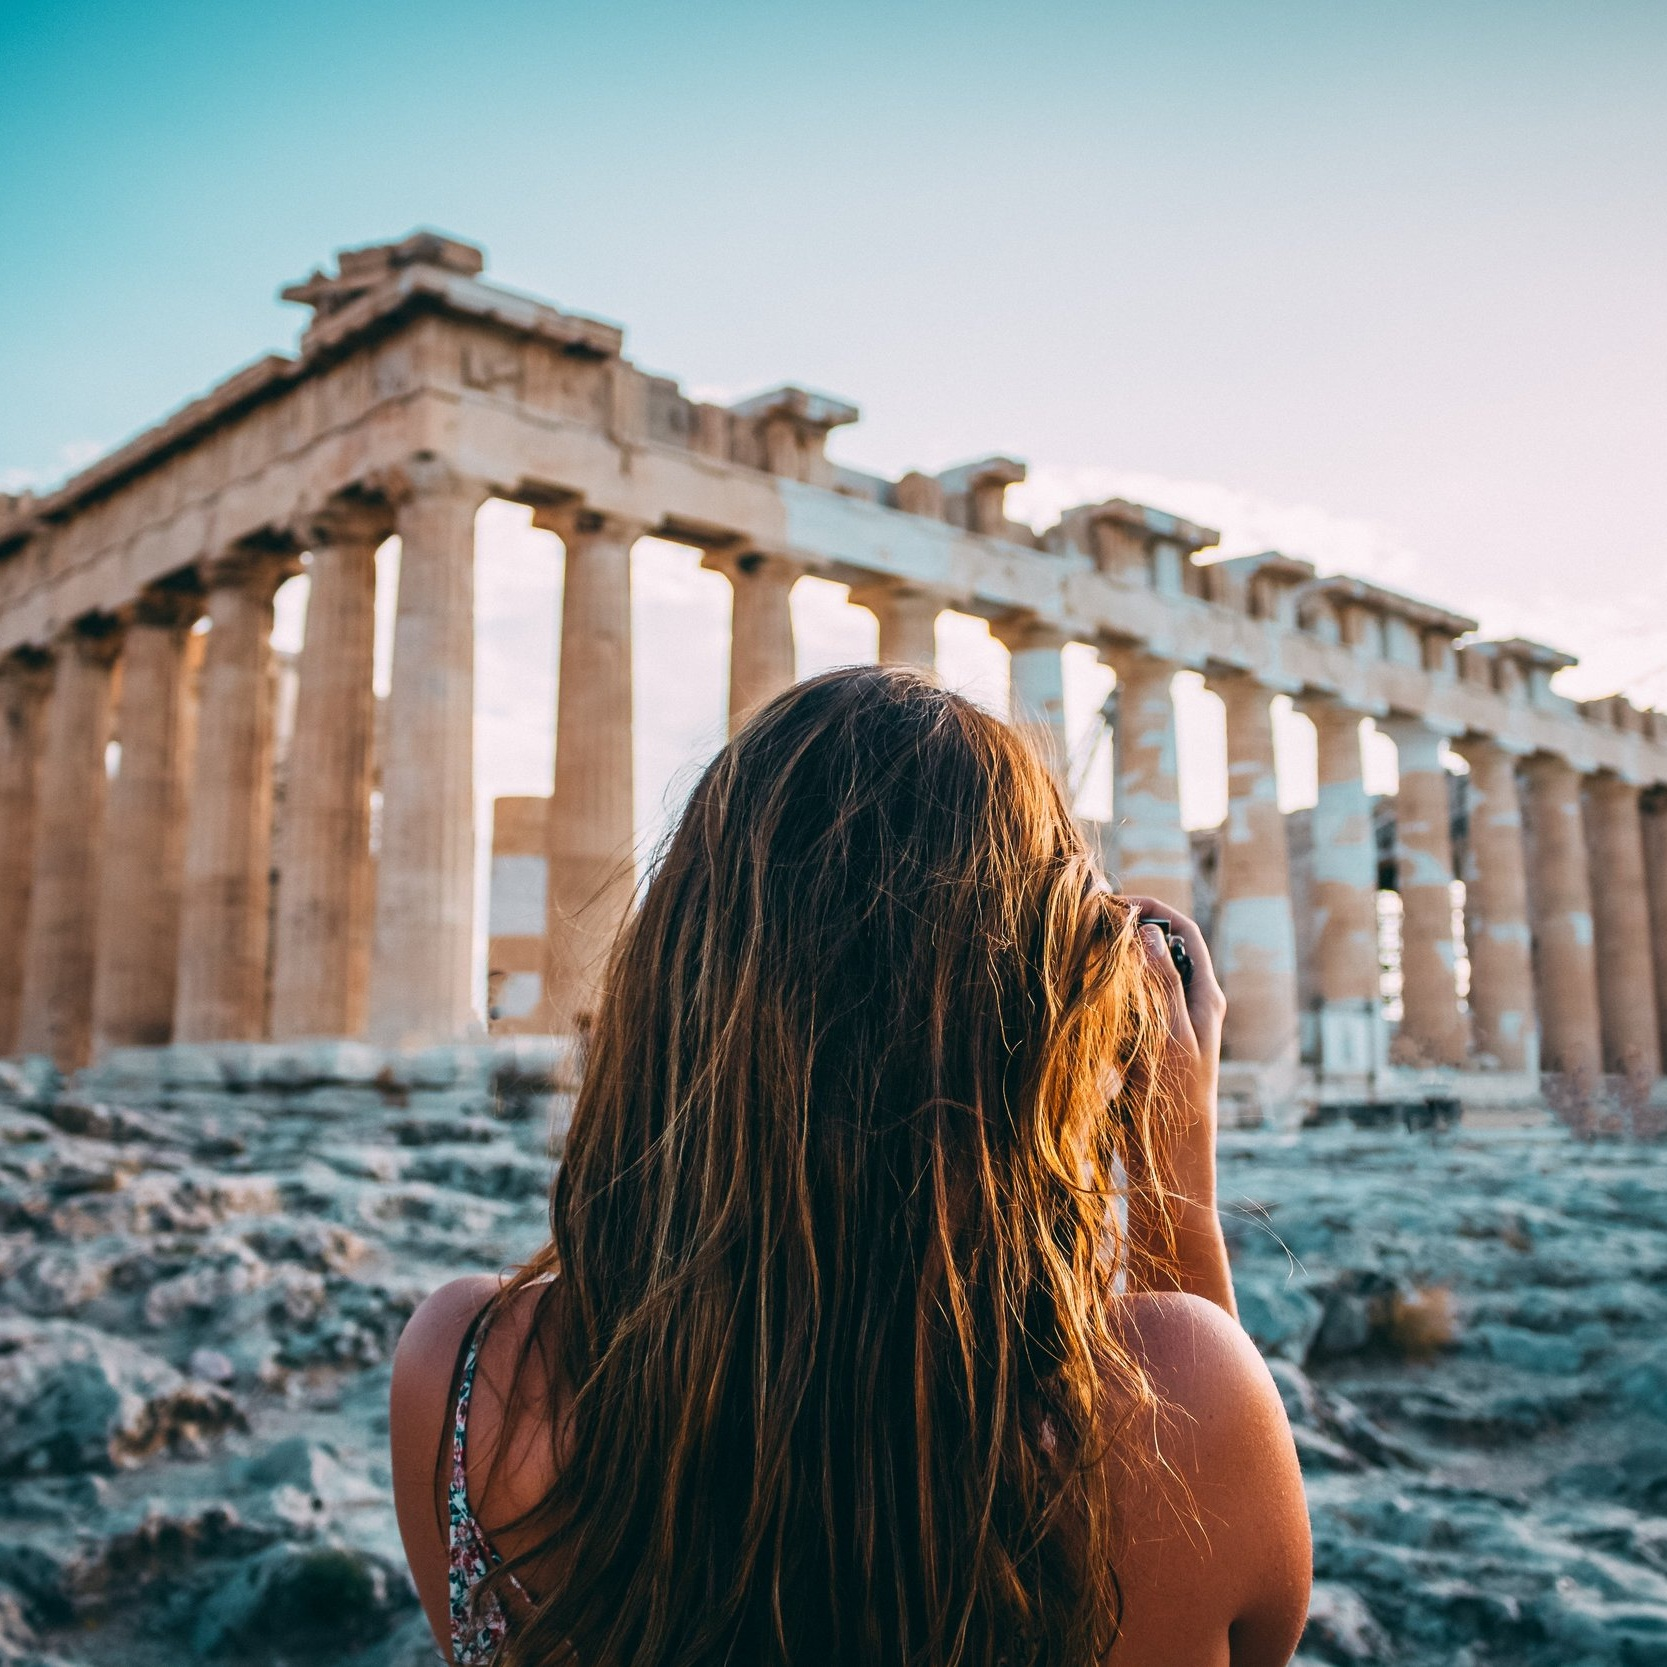 Athens%2C+Greece+arthur-yeti.jpg